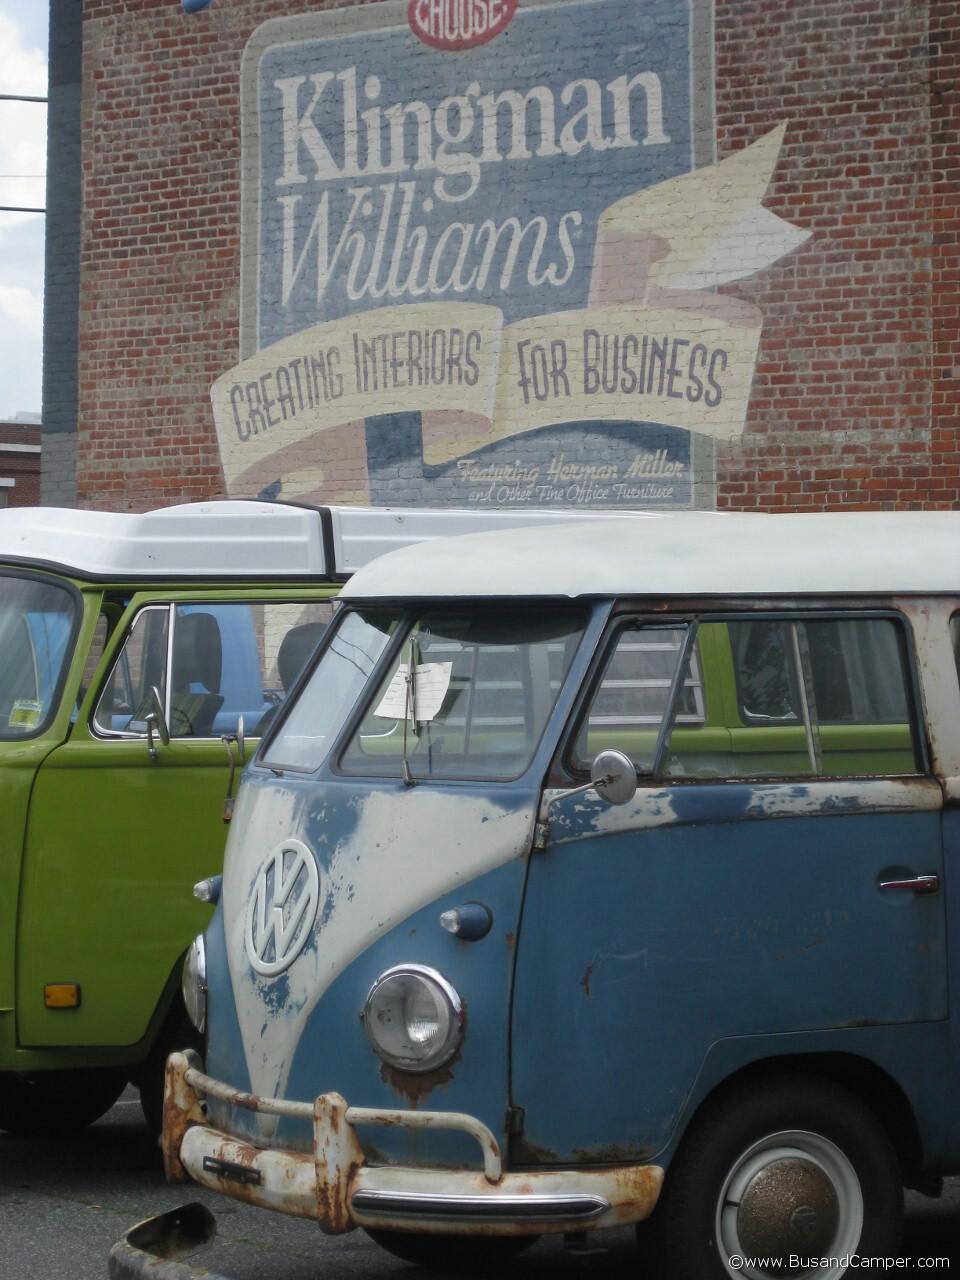 klingman Interiors Van